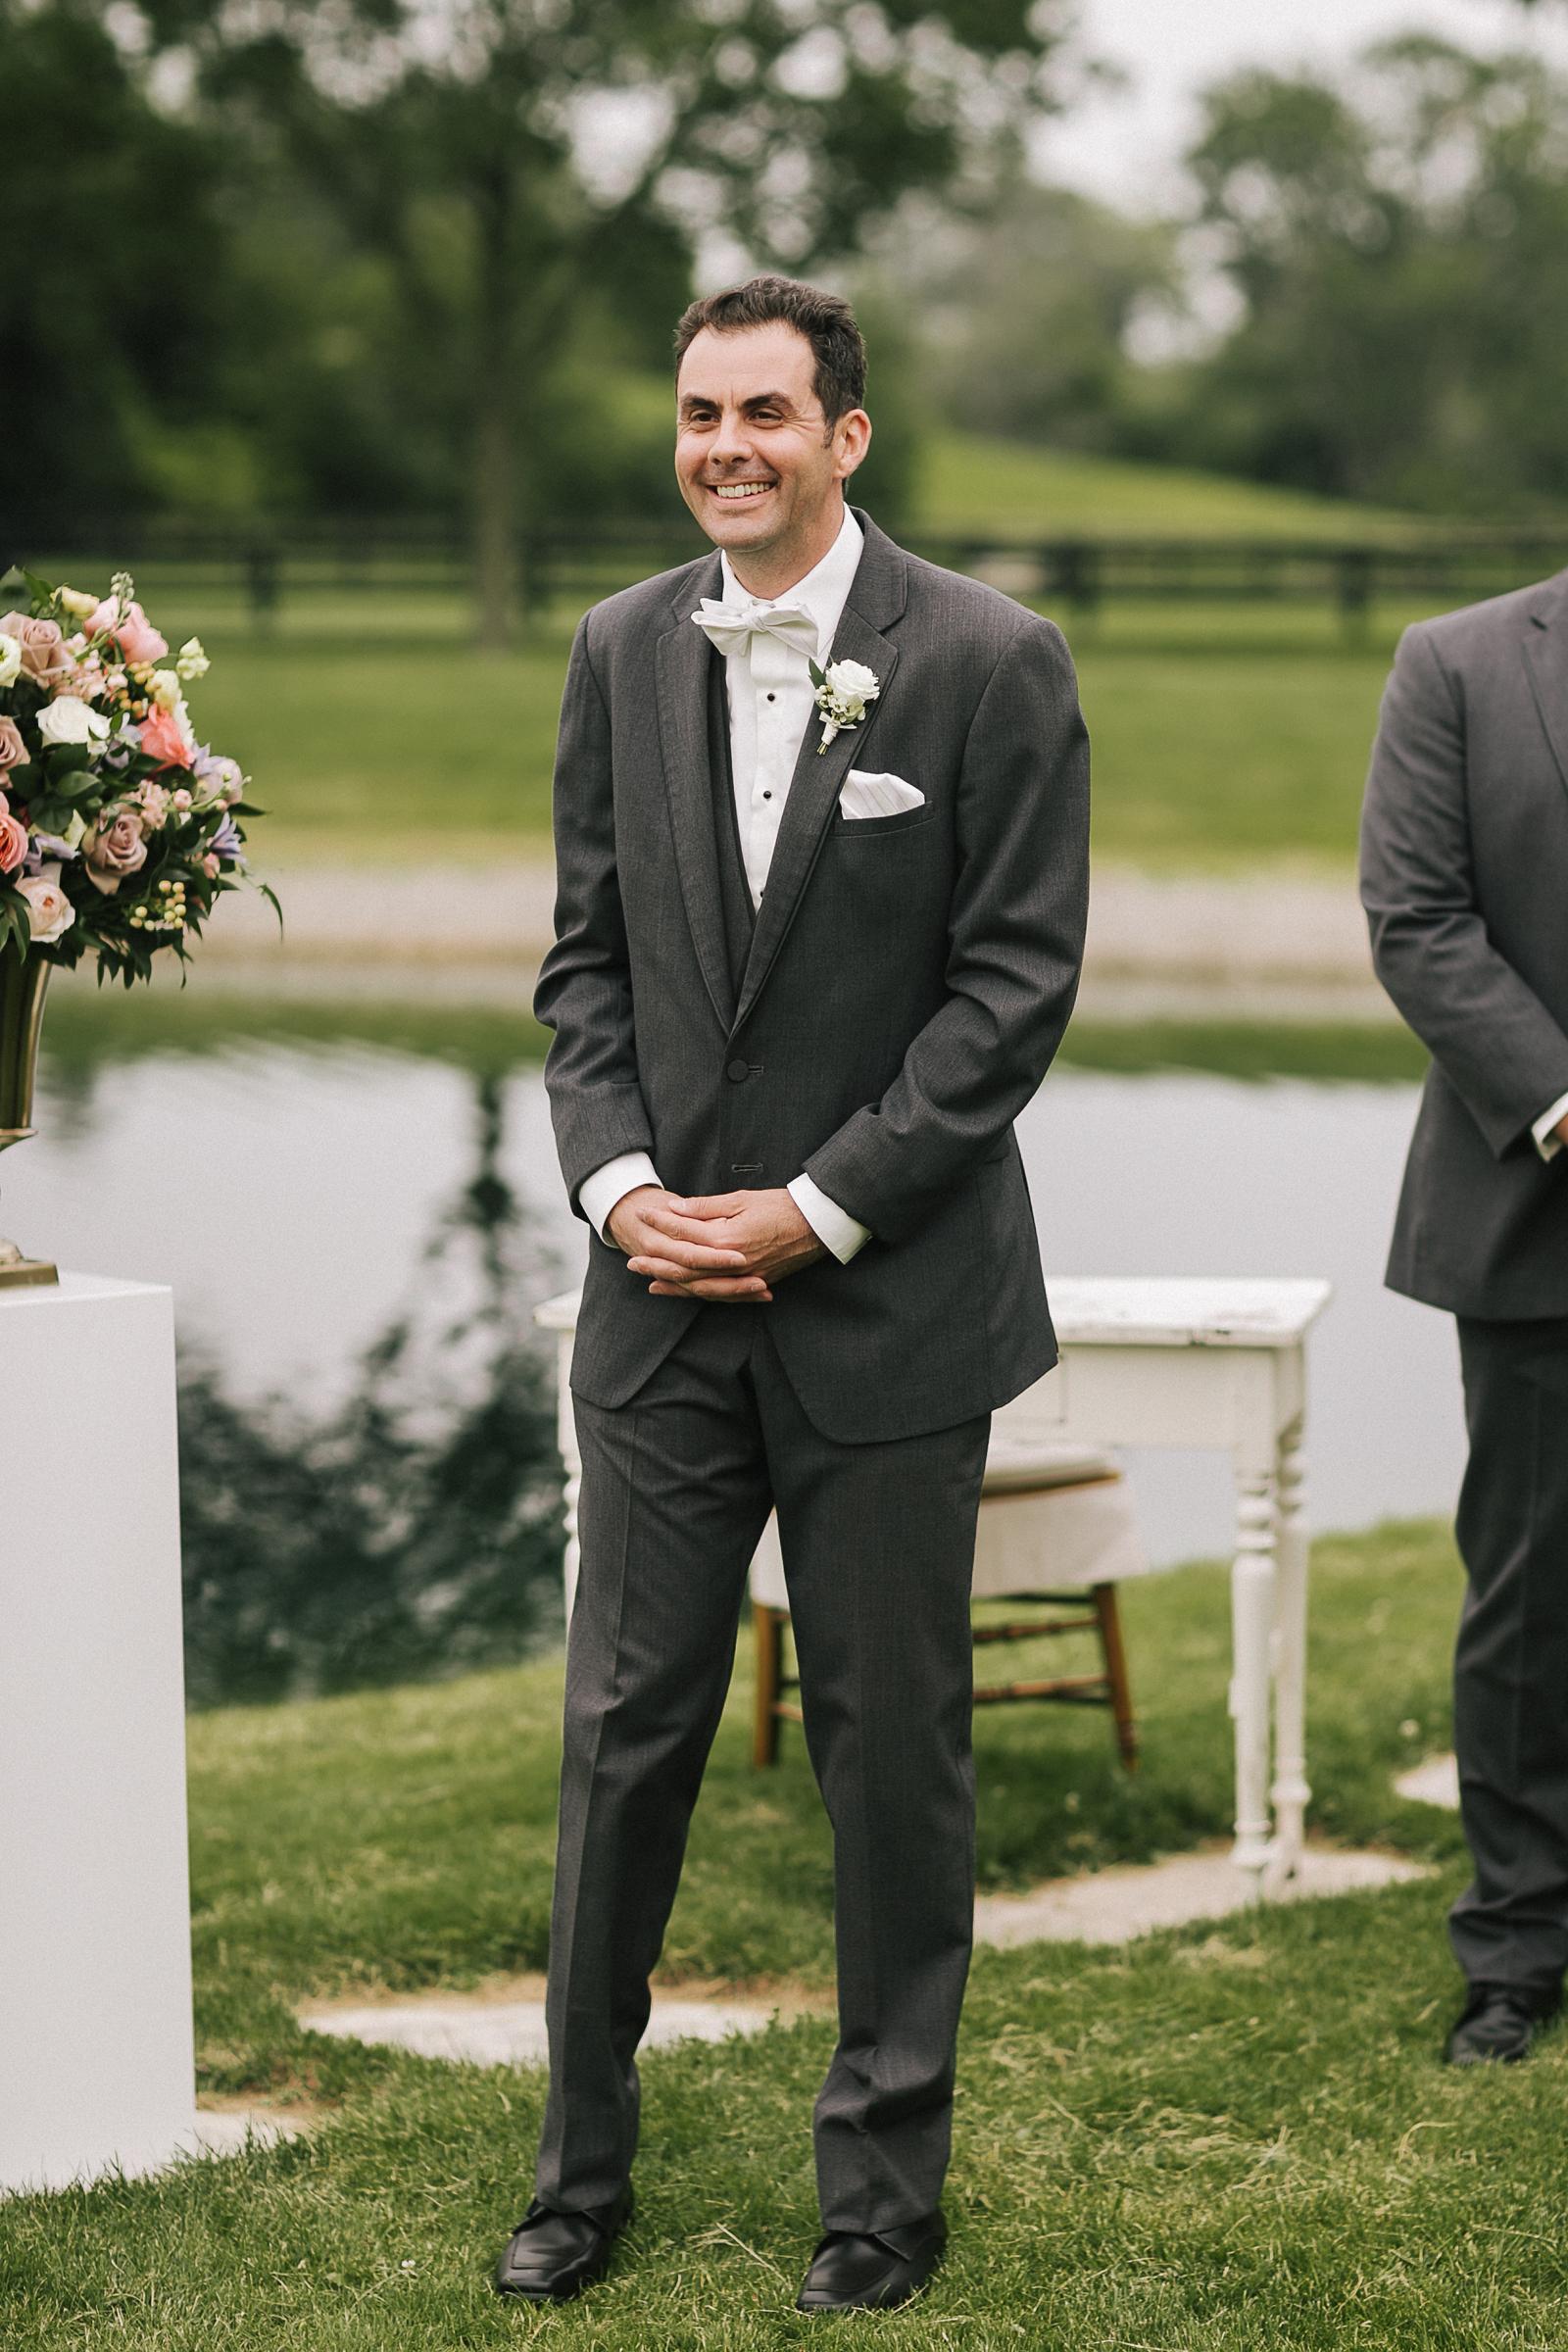 mike-and-jenni-wedding-228.jpg